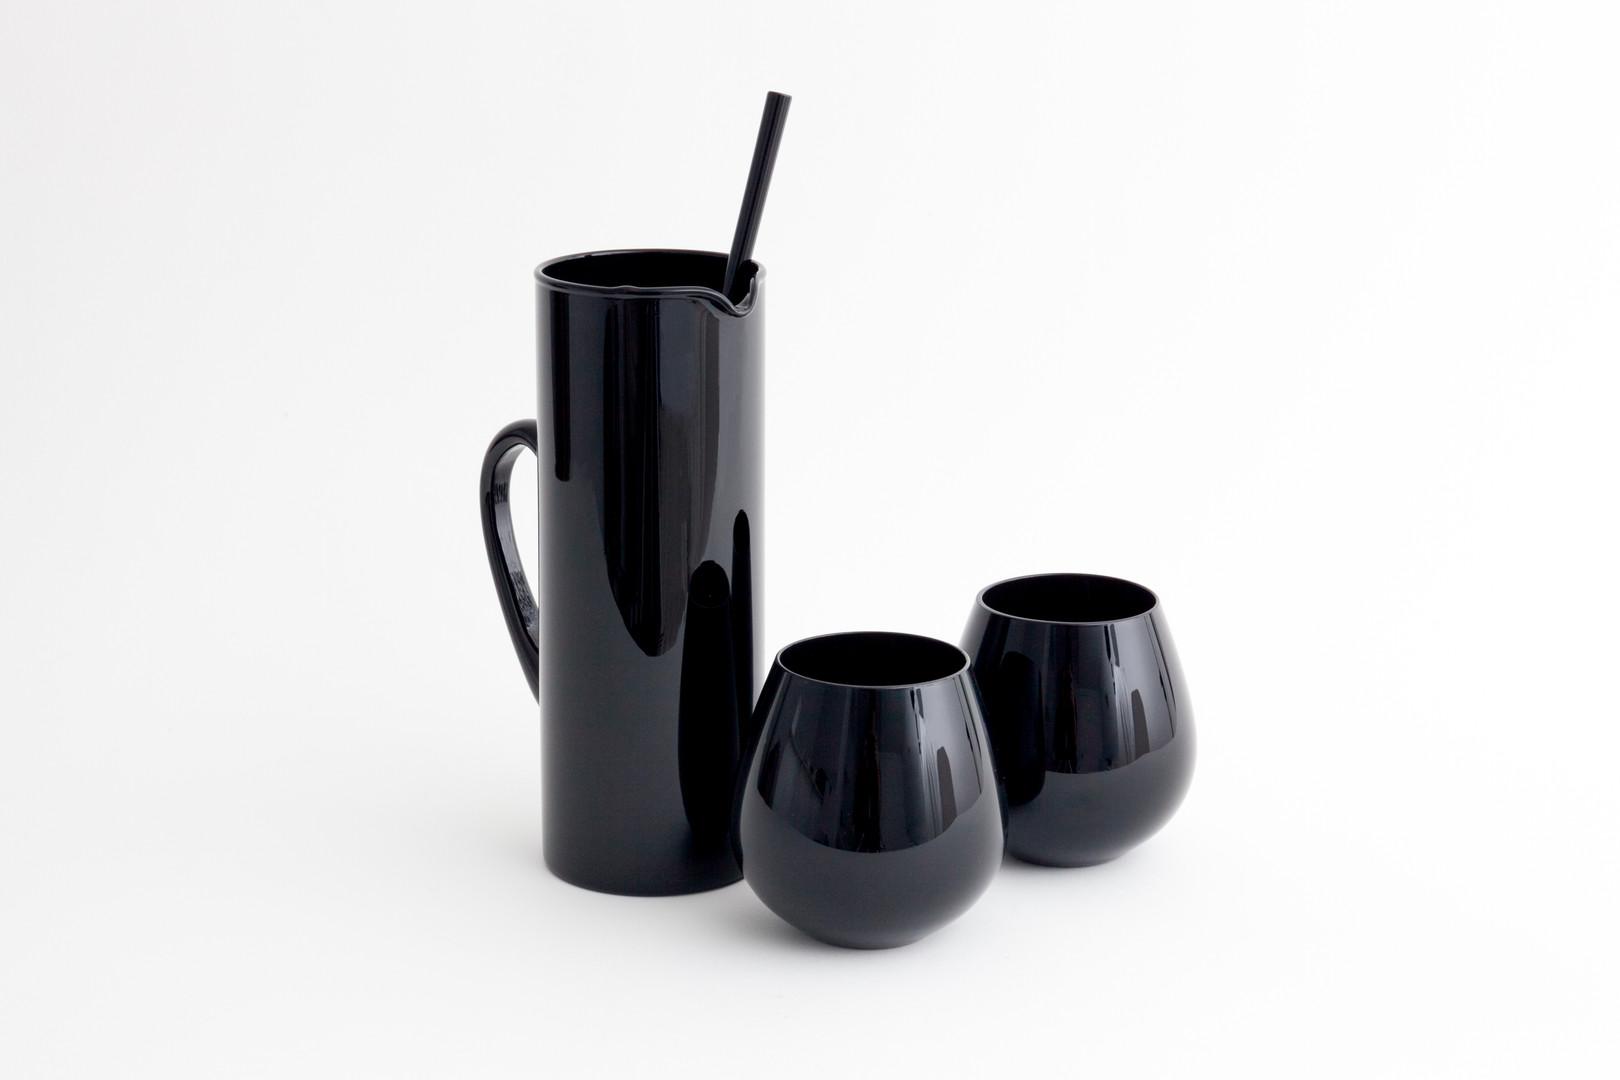 Black Decanter and Mug Set - Product Photography